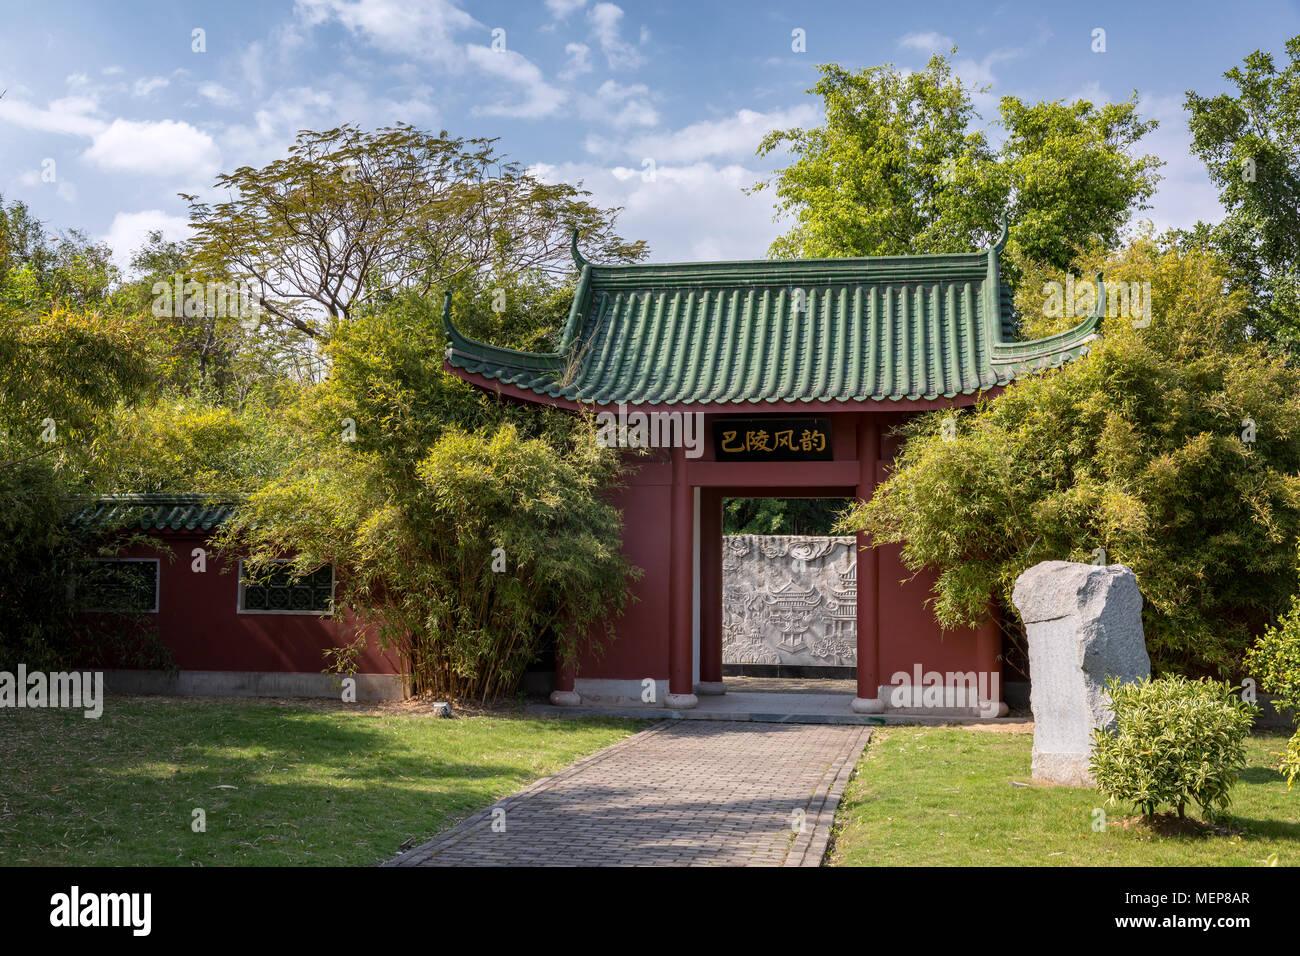 Entrance to a Chinese Temple, The Xiamen International Garden & Flower Expo Park, Jimei District, Xiamen, Fujian, China Stock Photo